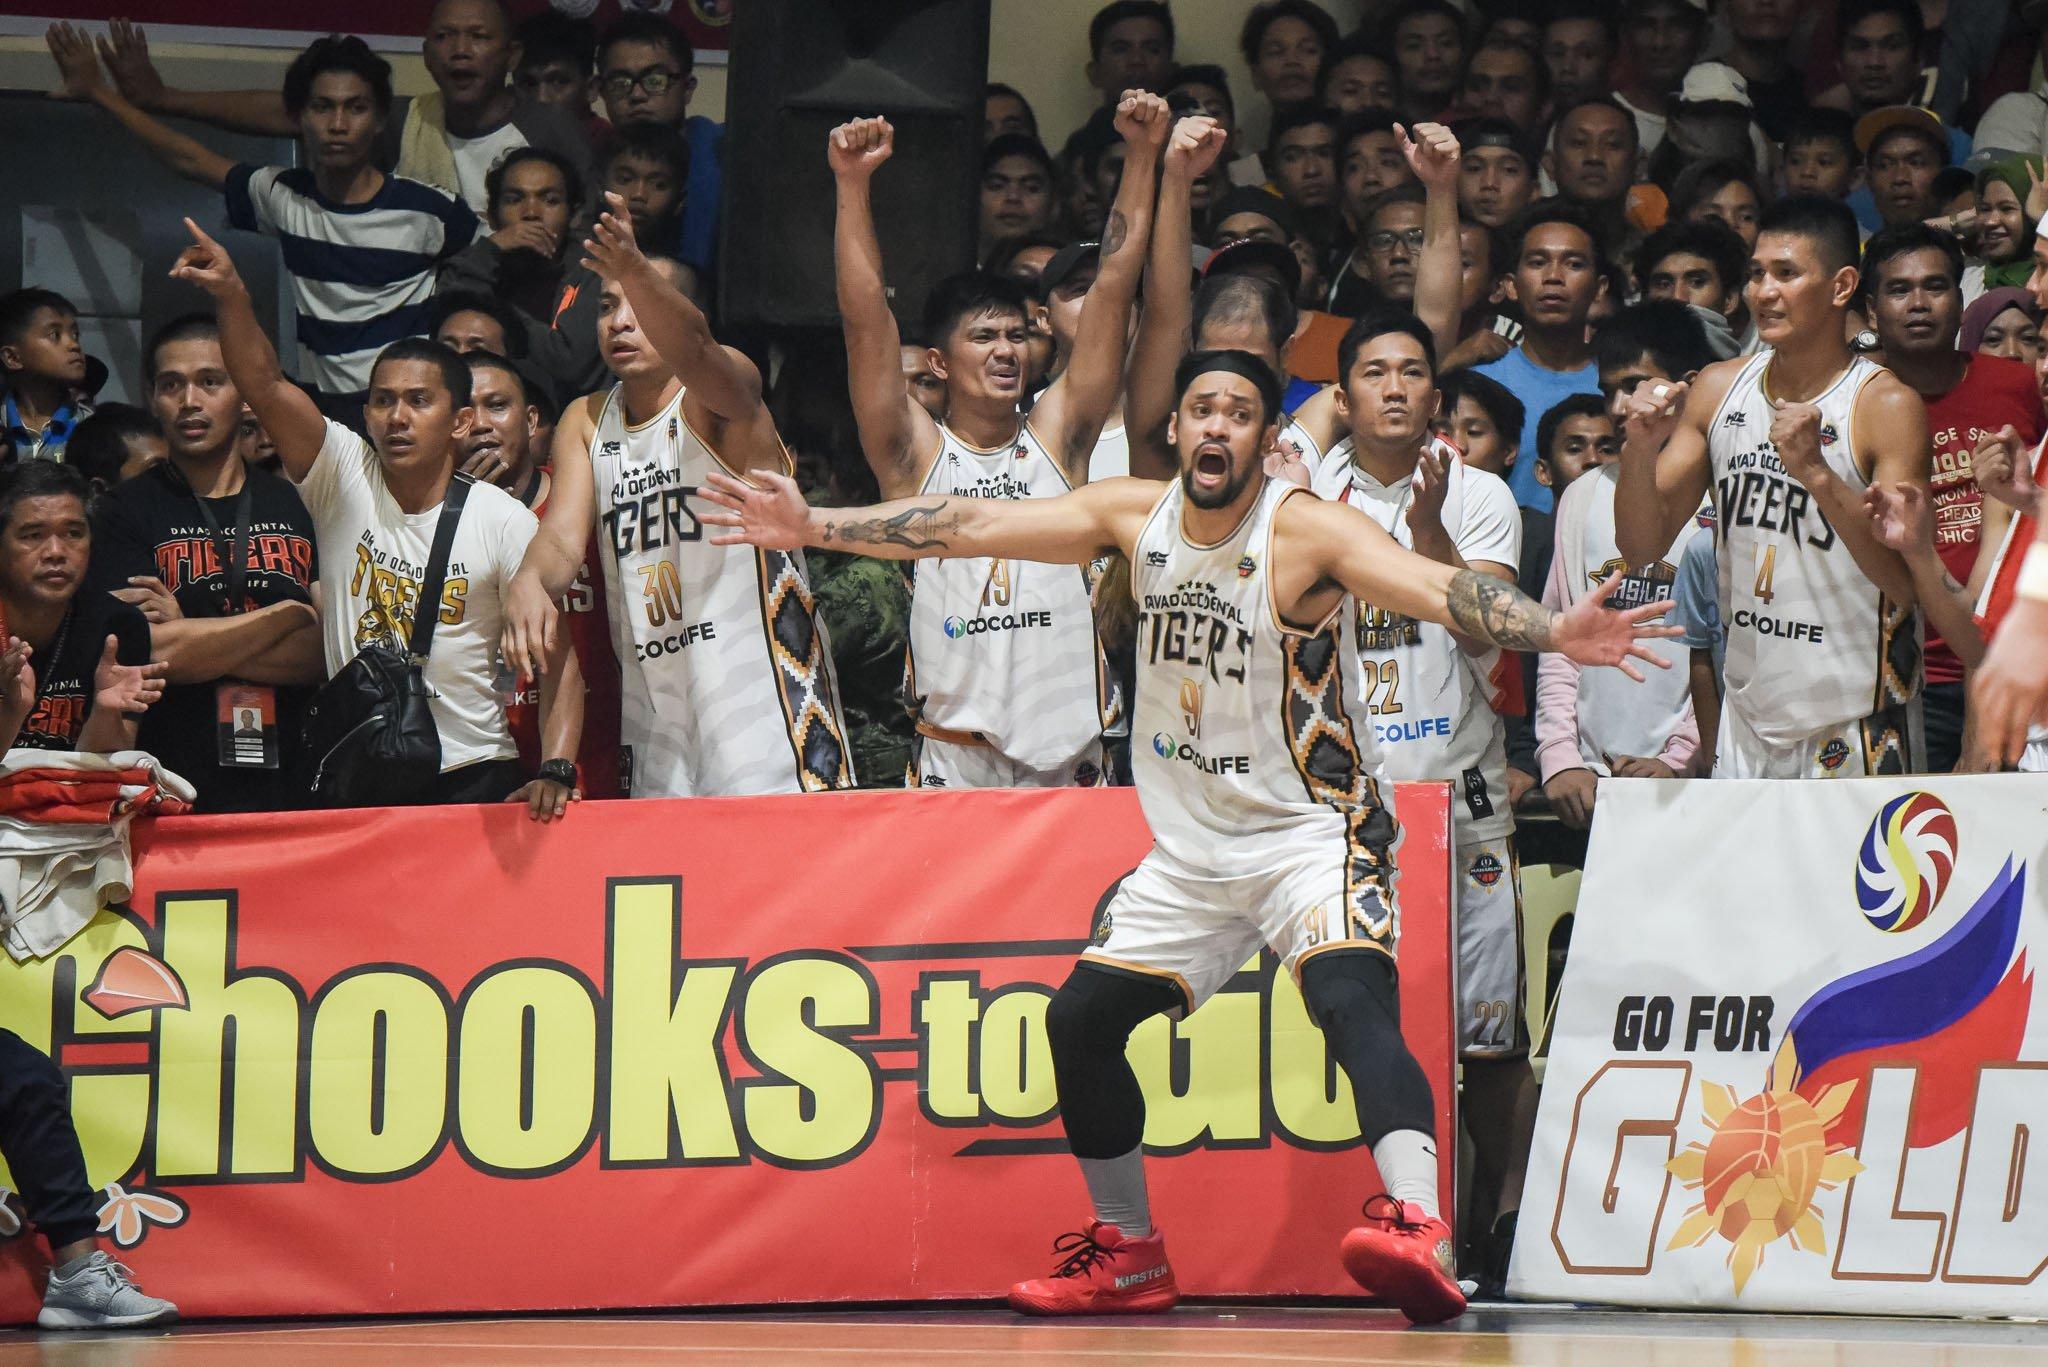 2019-Chooks-MPBL-Basilan-vs-Davao-Davao-bench MPBL suspends Division Finals indefinitely due to coronavirus pandemic Basketball MPBL News  - philippine sports news